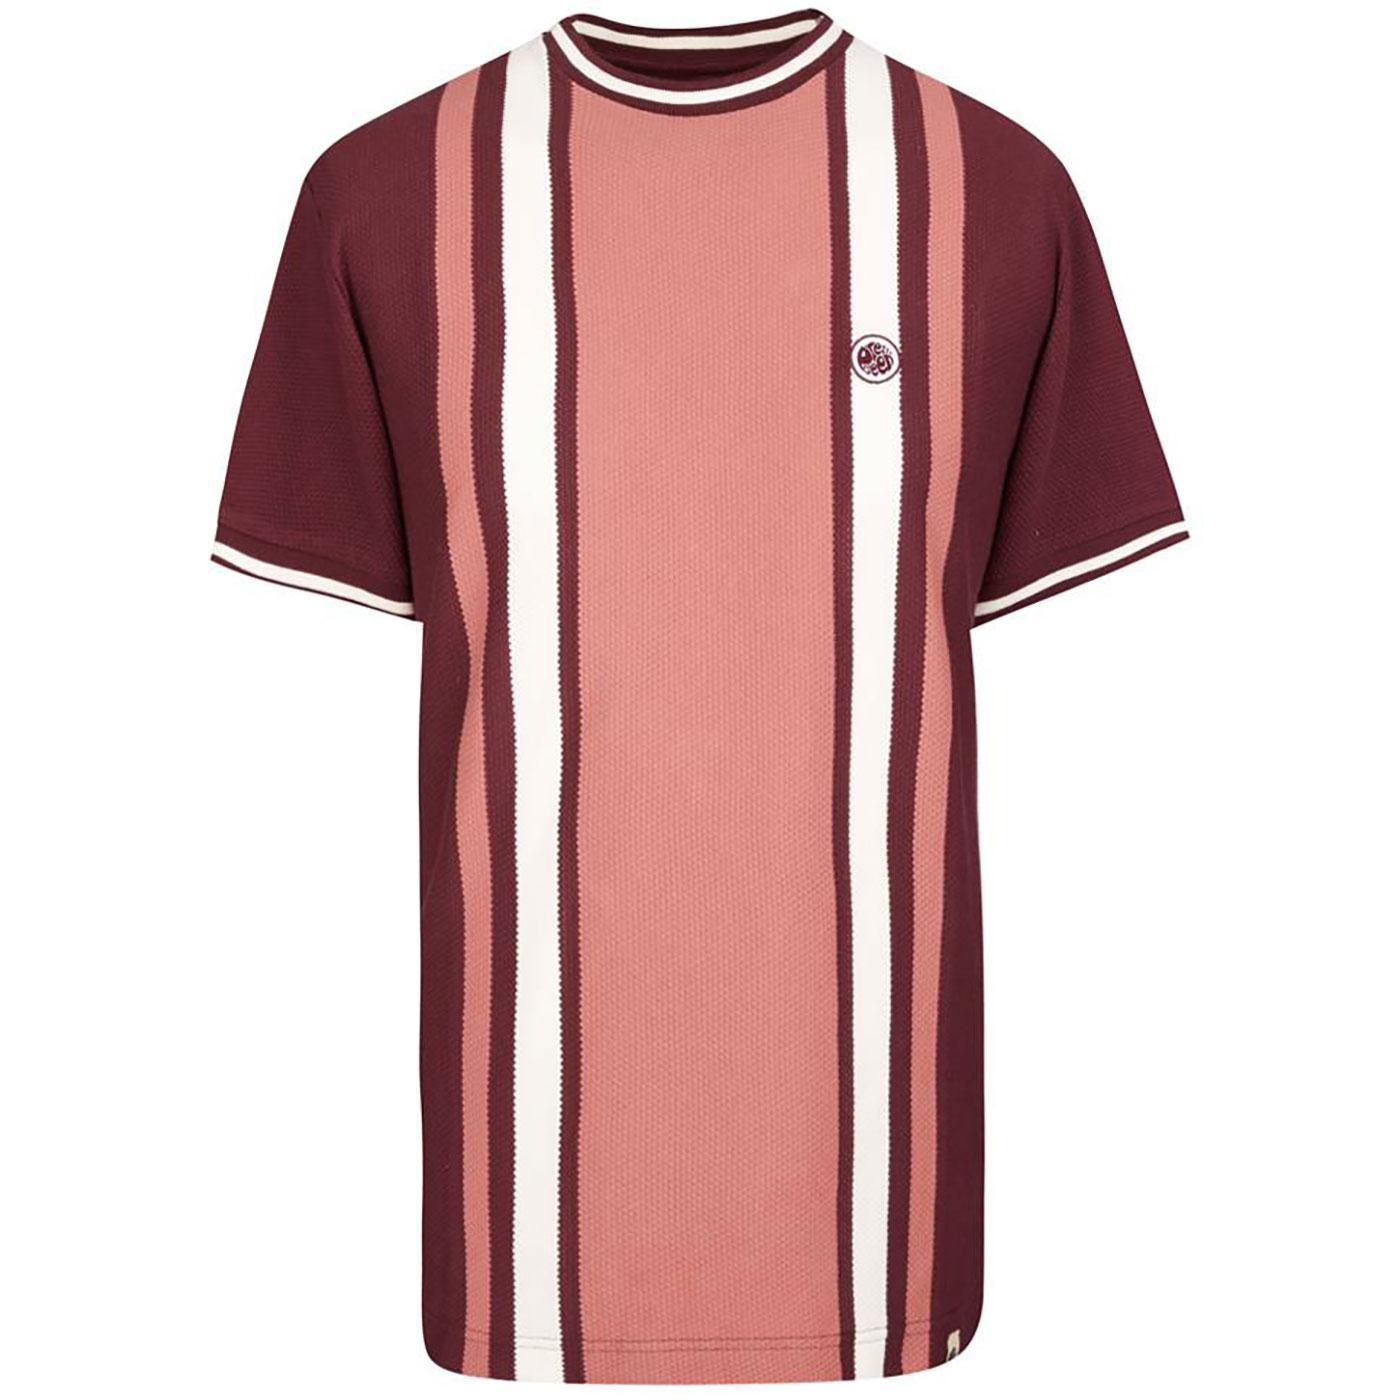 PRETTY GREEN Men's Mod Textured Stripe T-Shirt R